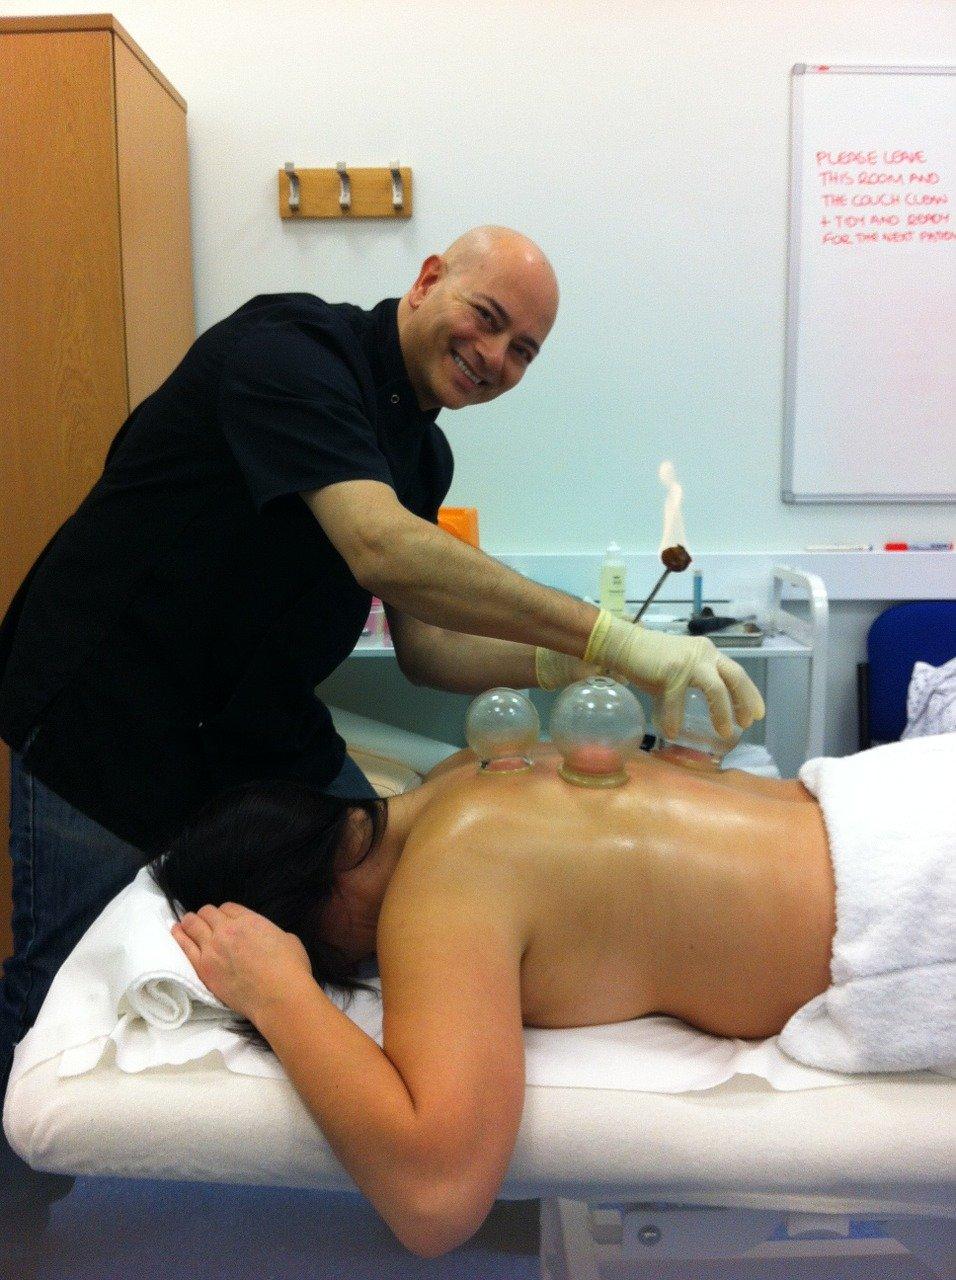 Fysio & Manueeltherapie Van Os massage fysio